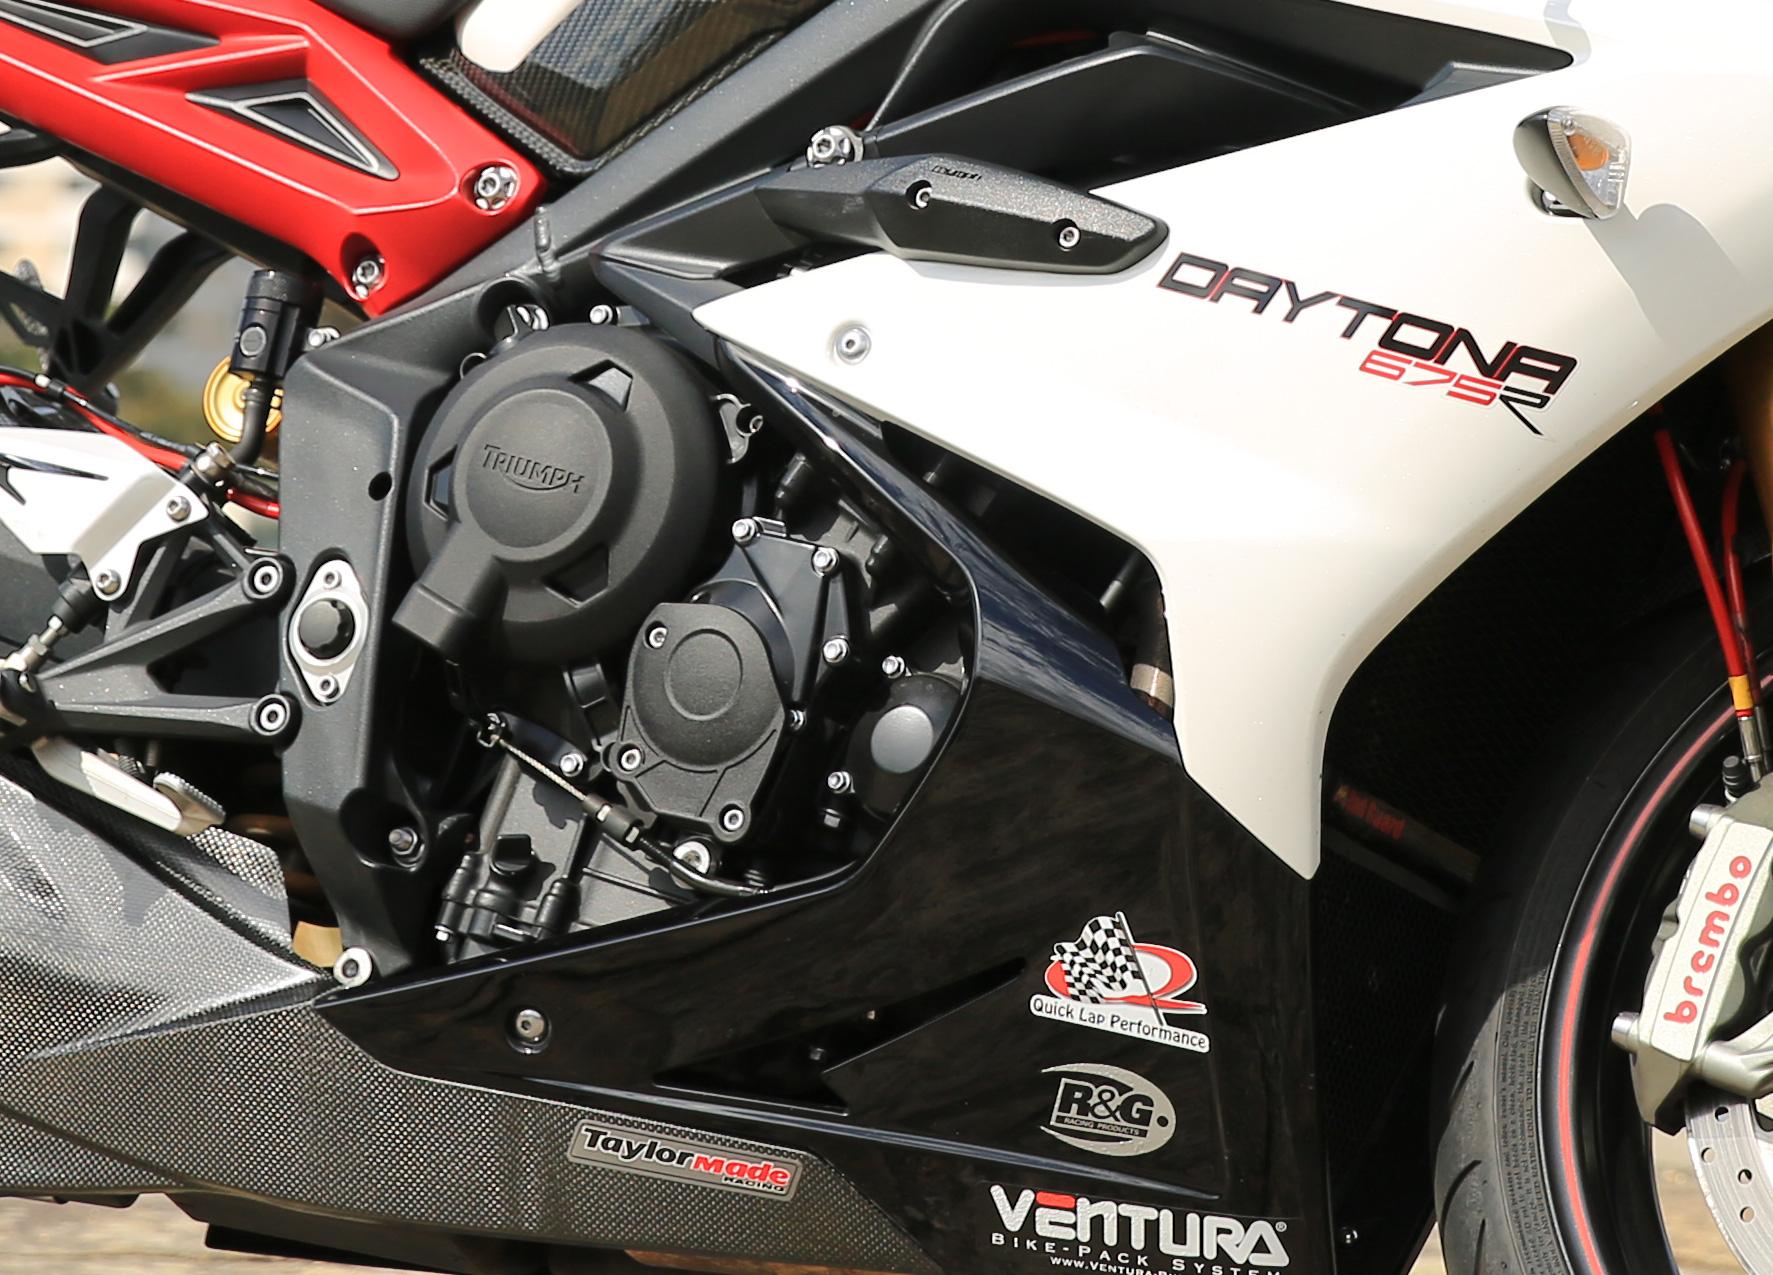 Staff Bike: Kris's 2013 Triumph Daytona 675 R - Bike Review